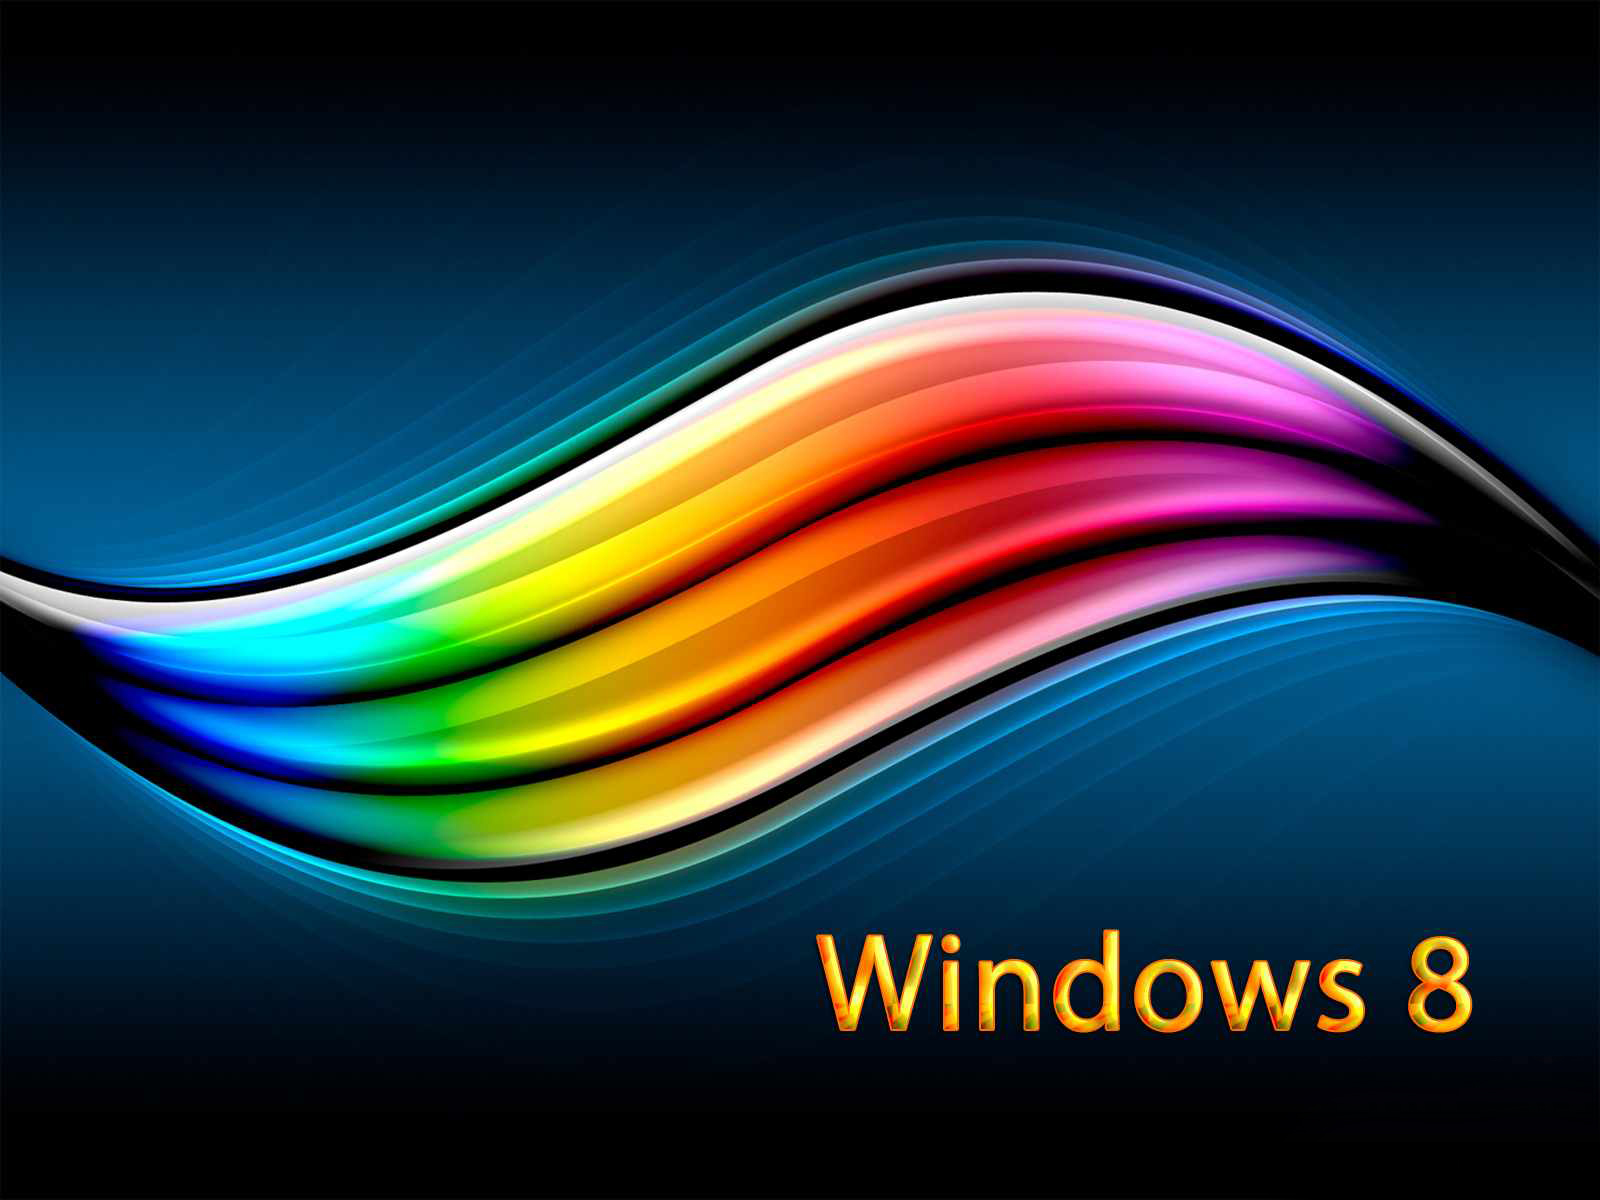 windows 8 new wallpaper hd for desktop free 1080p download ...